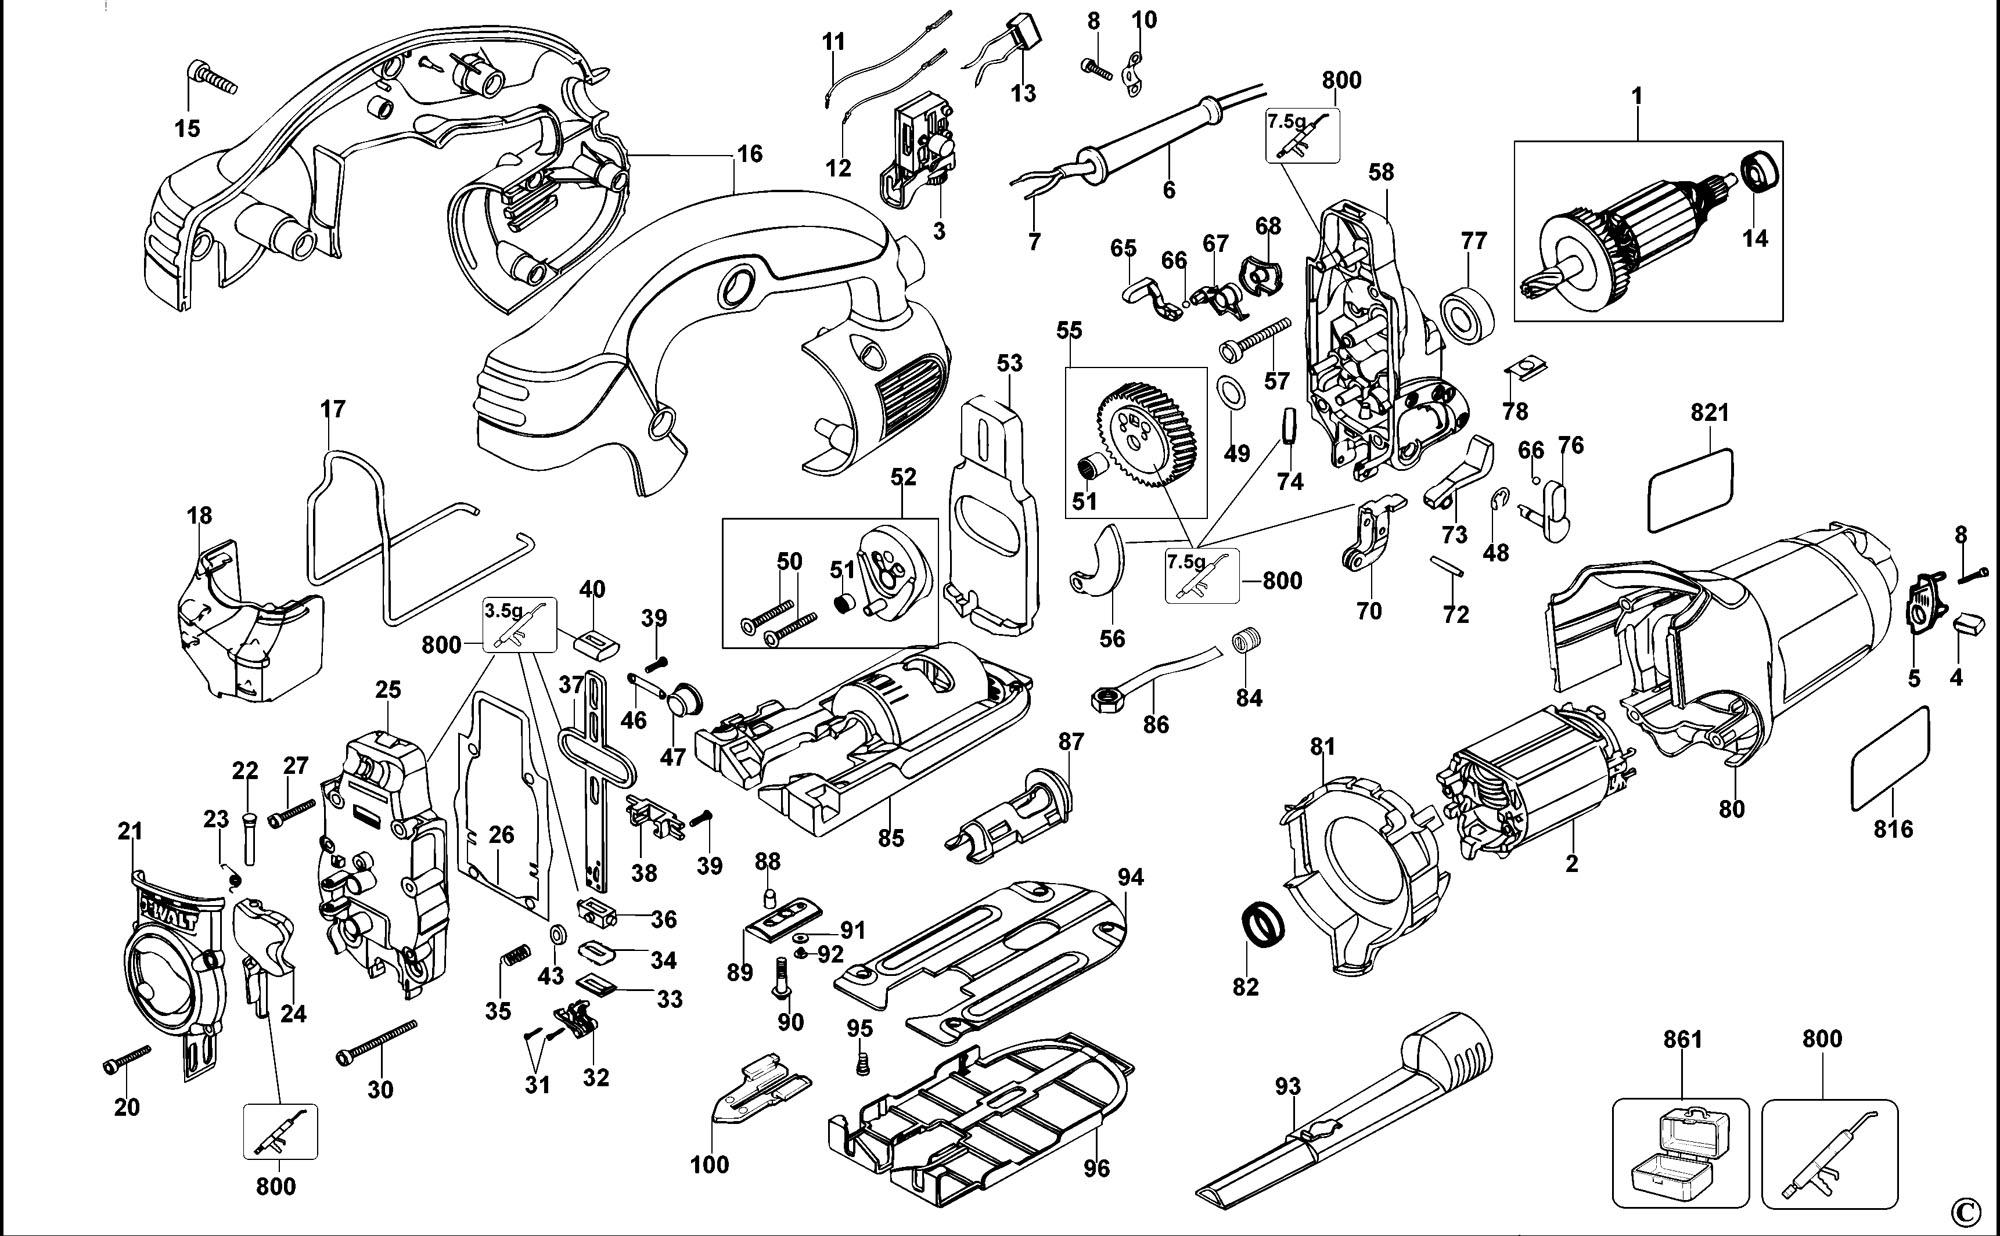 Spares For Dewalt Dw331 Jigsaw Type 1 Spare Dw331 Type 1